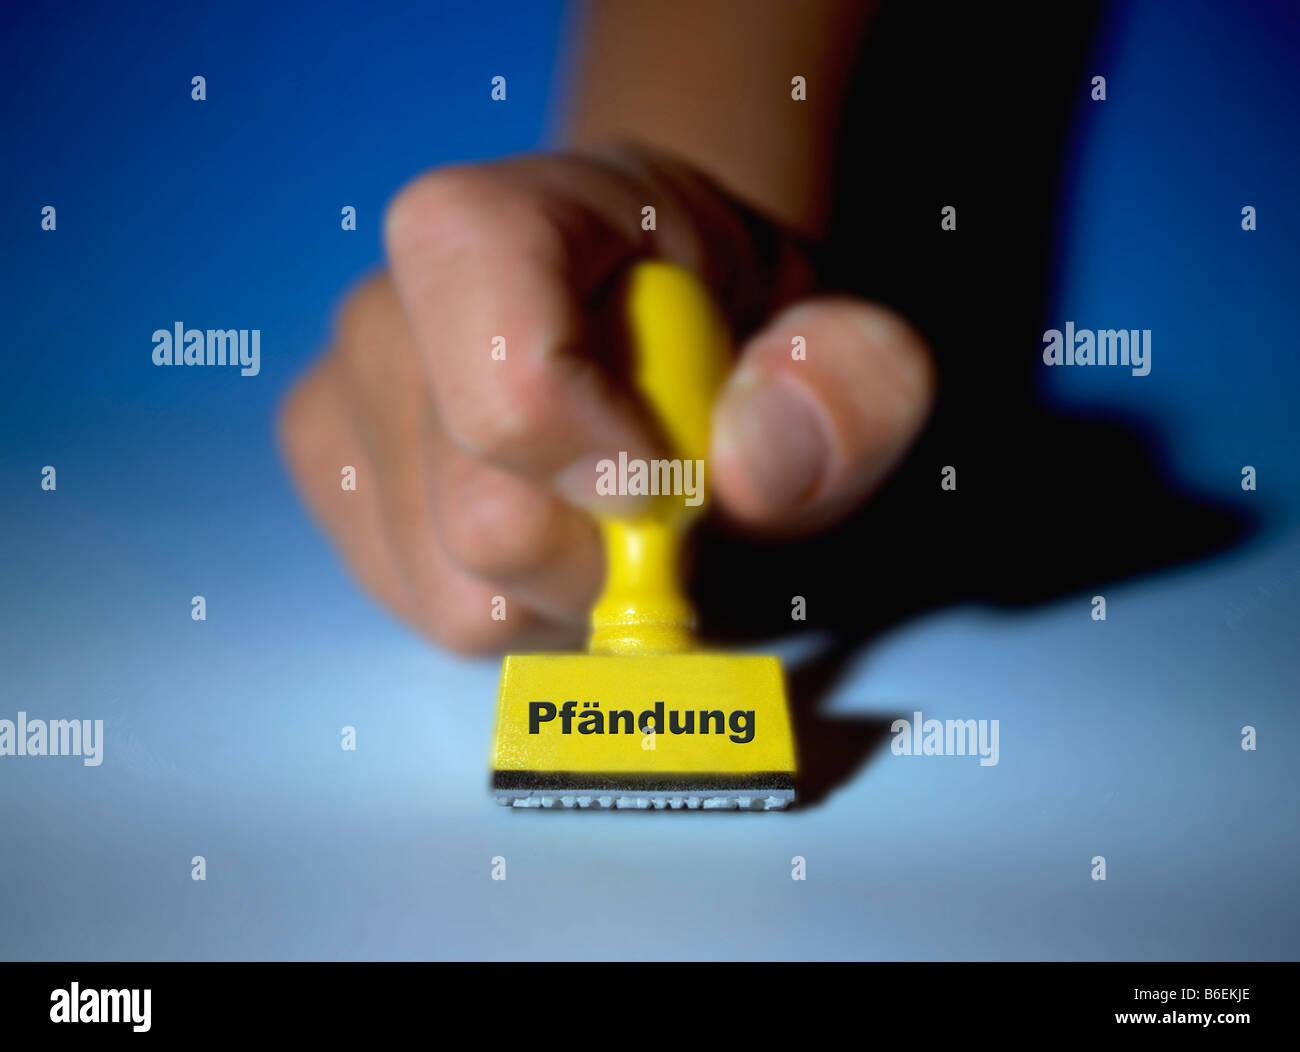 digitale Verbesserung Stempel markiert im deutschen pfandung Stockbild